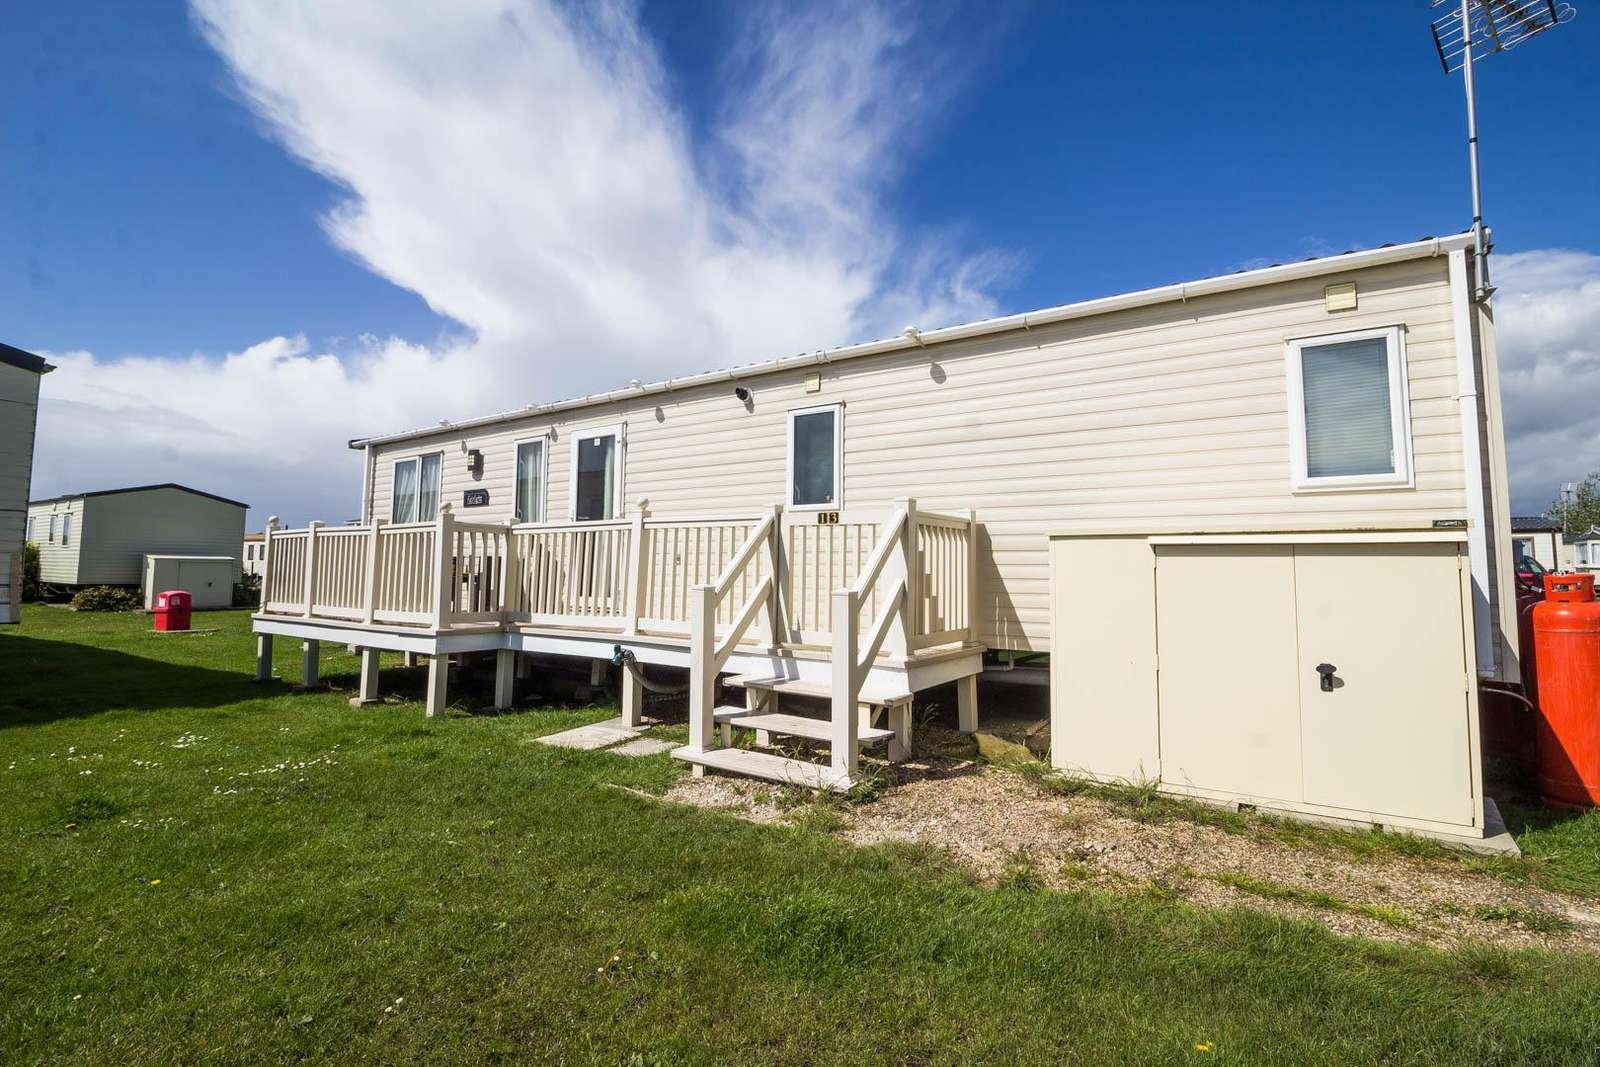 28013FI – Flatford Island area, 3 bed, 8 berth caravan with D/G & C/H. Diamond-Plus rated. - property